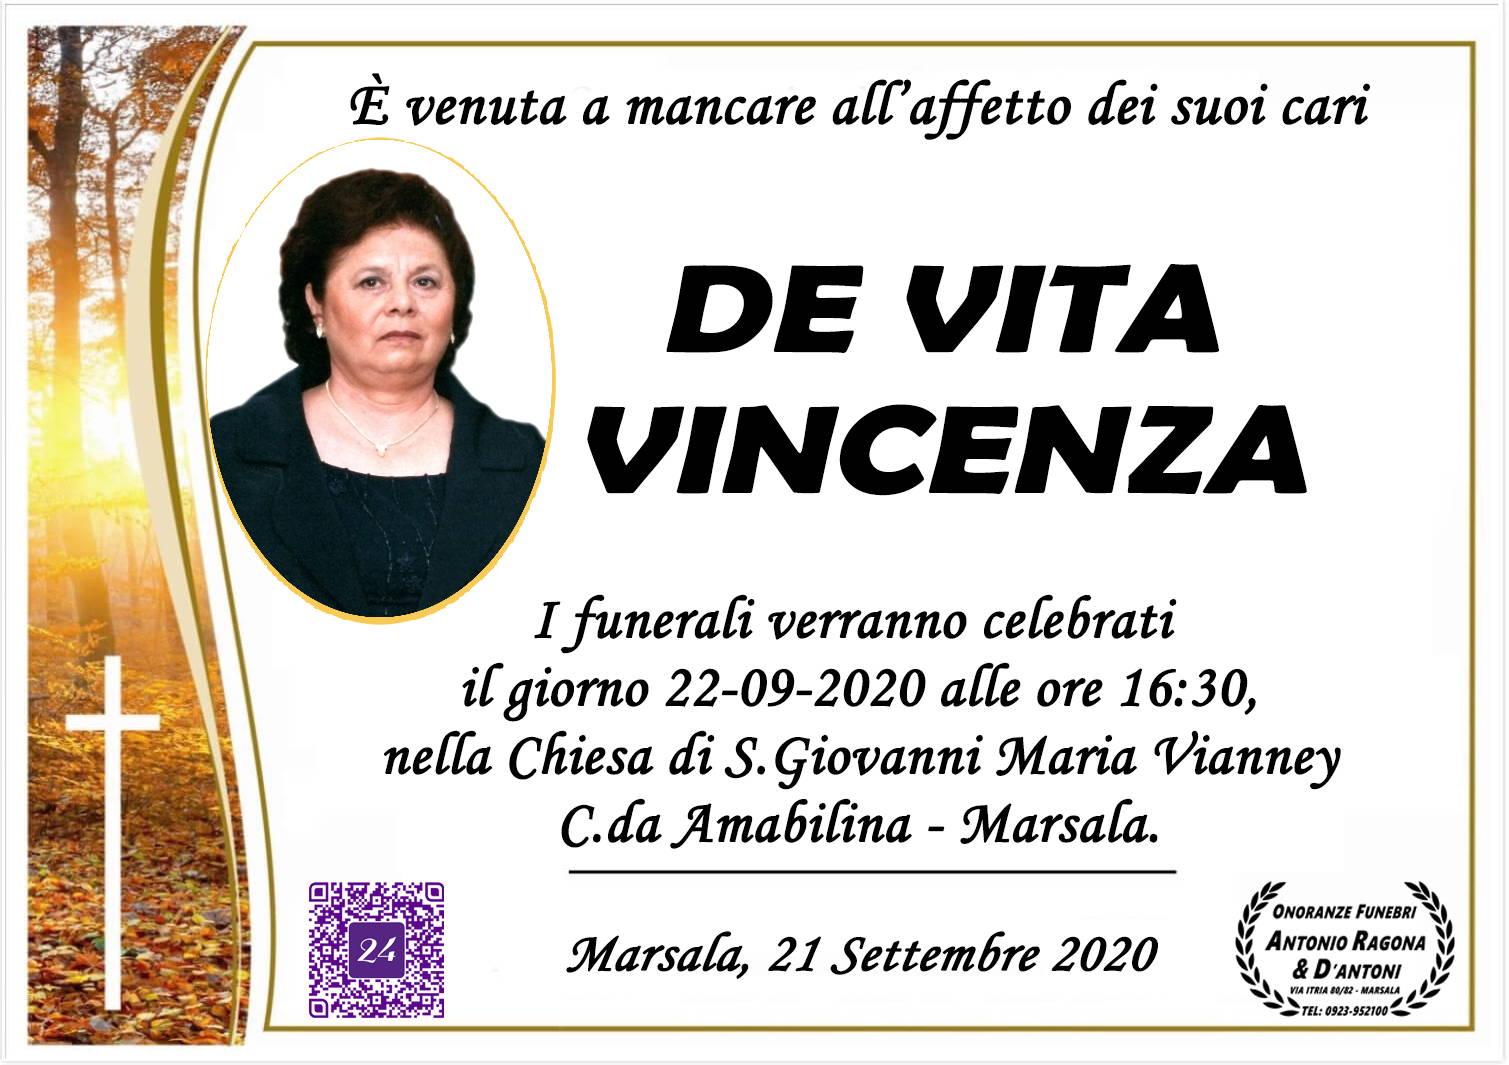 Vincenza De Vita